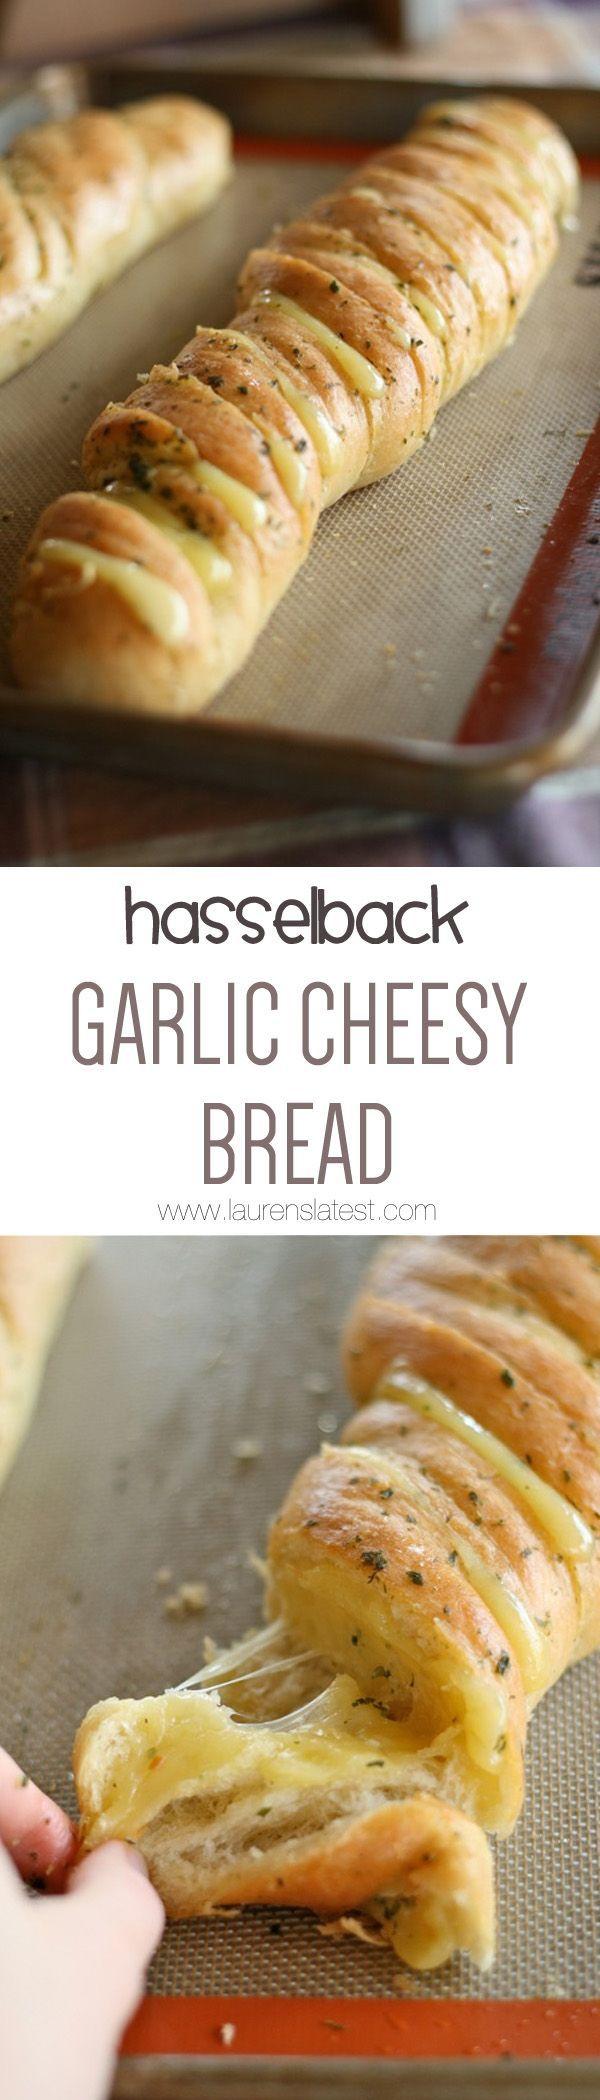 Hasselback Garlic Cheesy Bread! It's the bomb {dot} com.